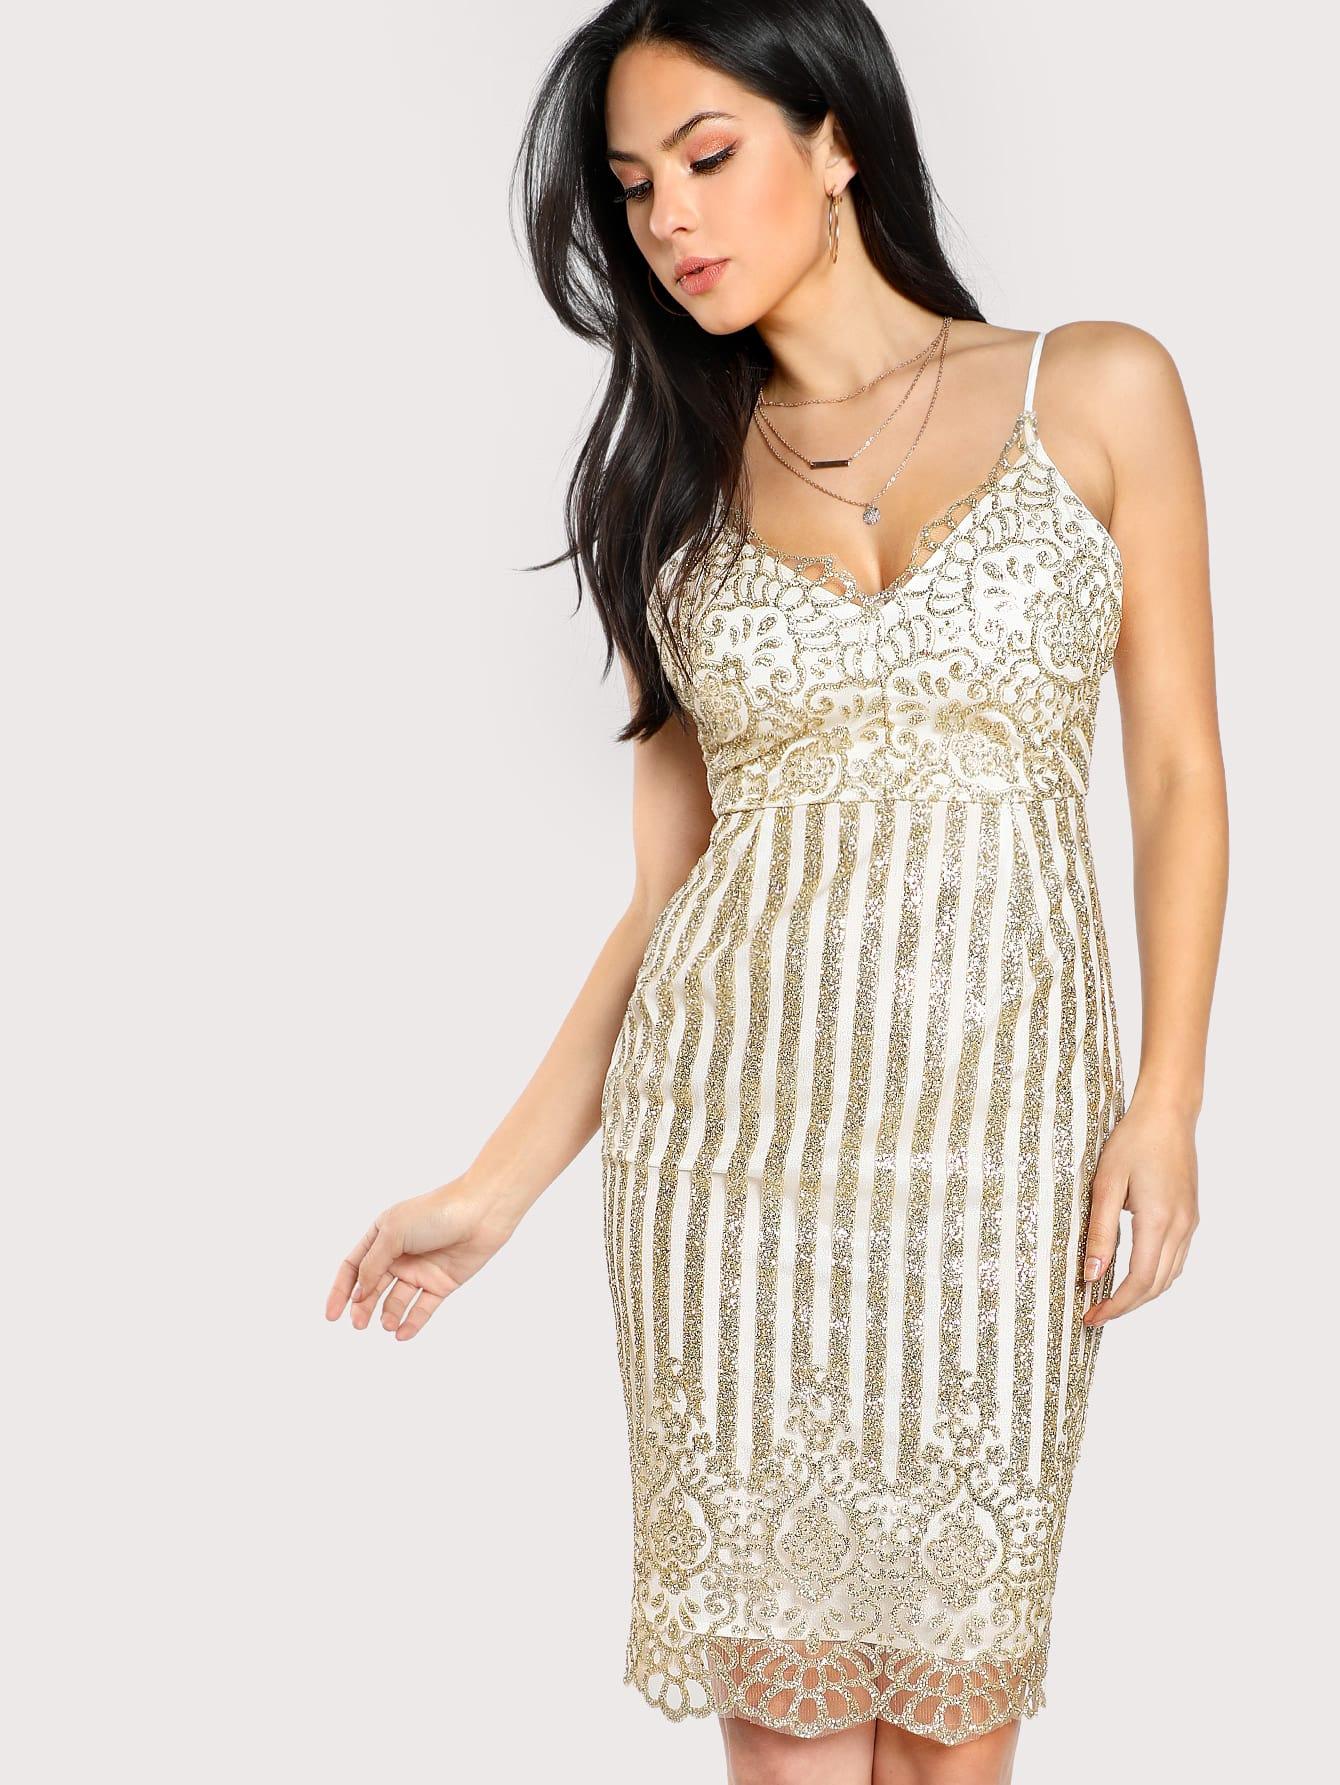 Glitter Lace Overlay Cami Dress glitter cami top